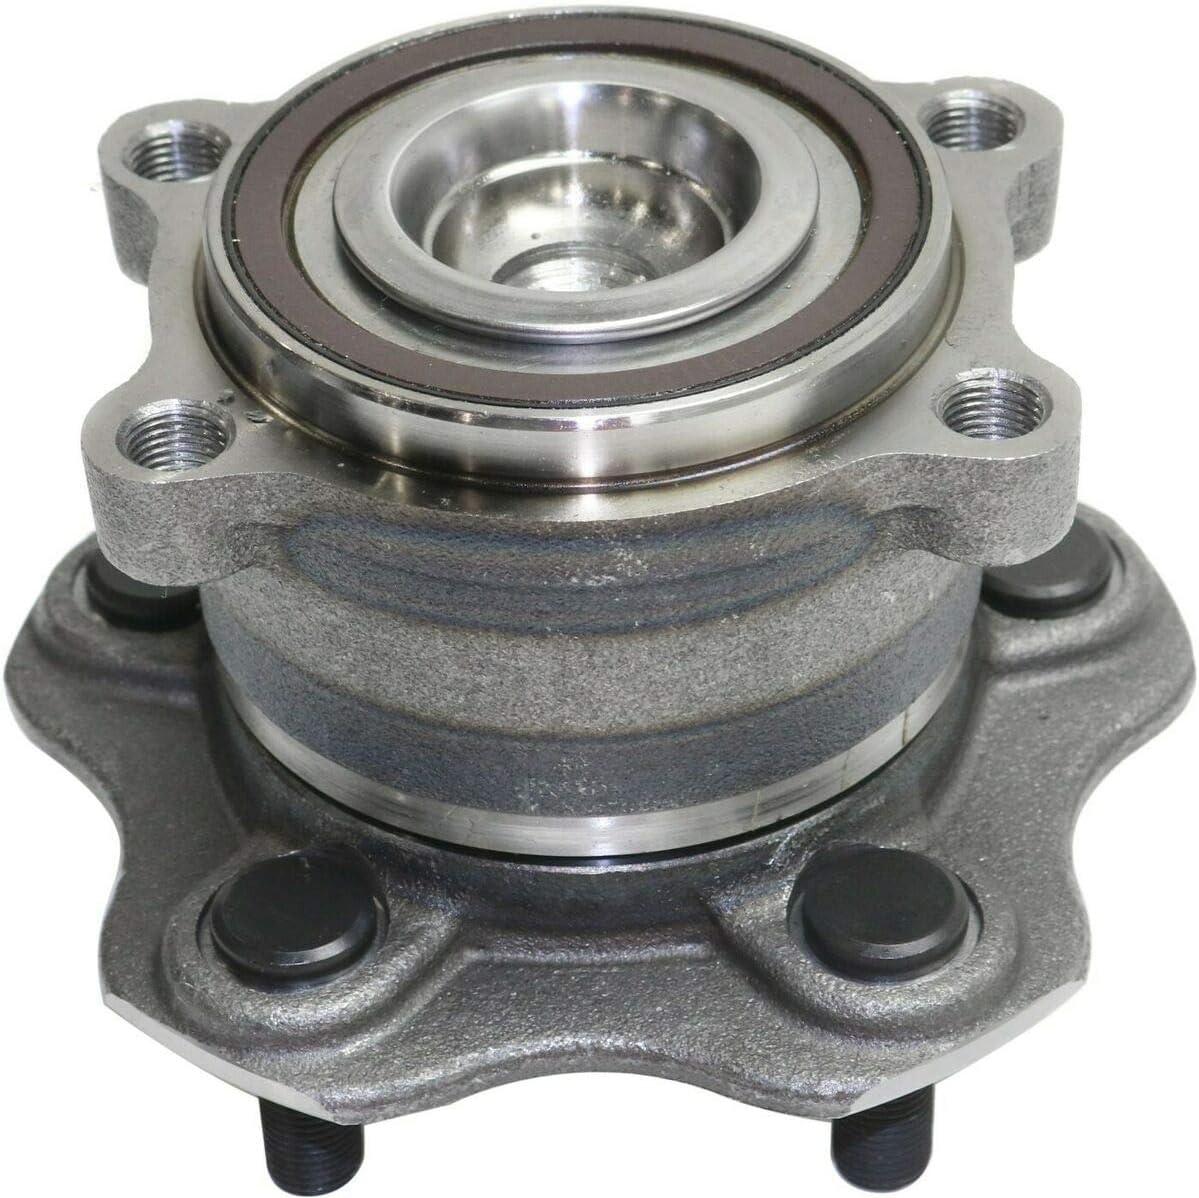 Rear Wheel Hub Bearing W ABS Fit 安い 激安 プチプラ 高品質 Nissan with Compatible 2009-2 爆安プライス